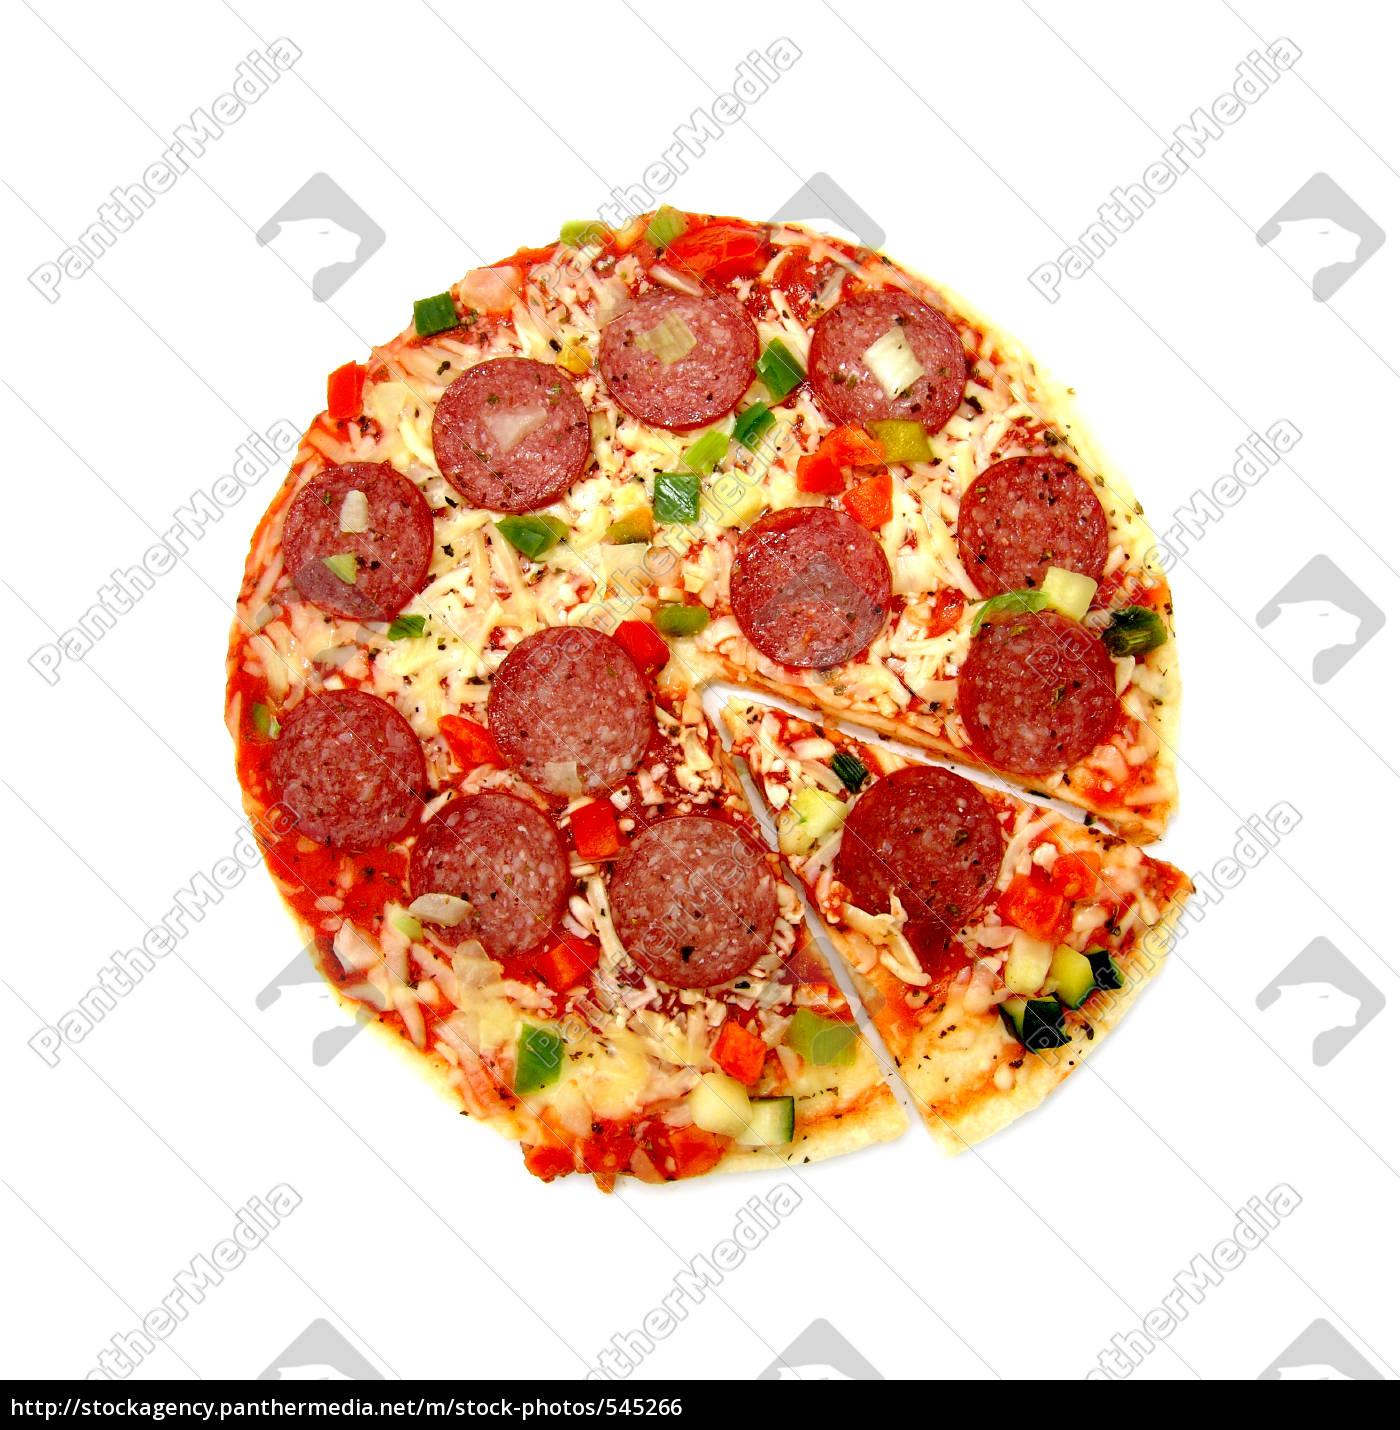 salamipizza - 545266